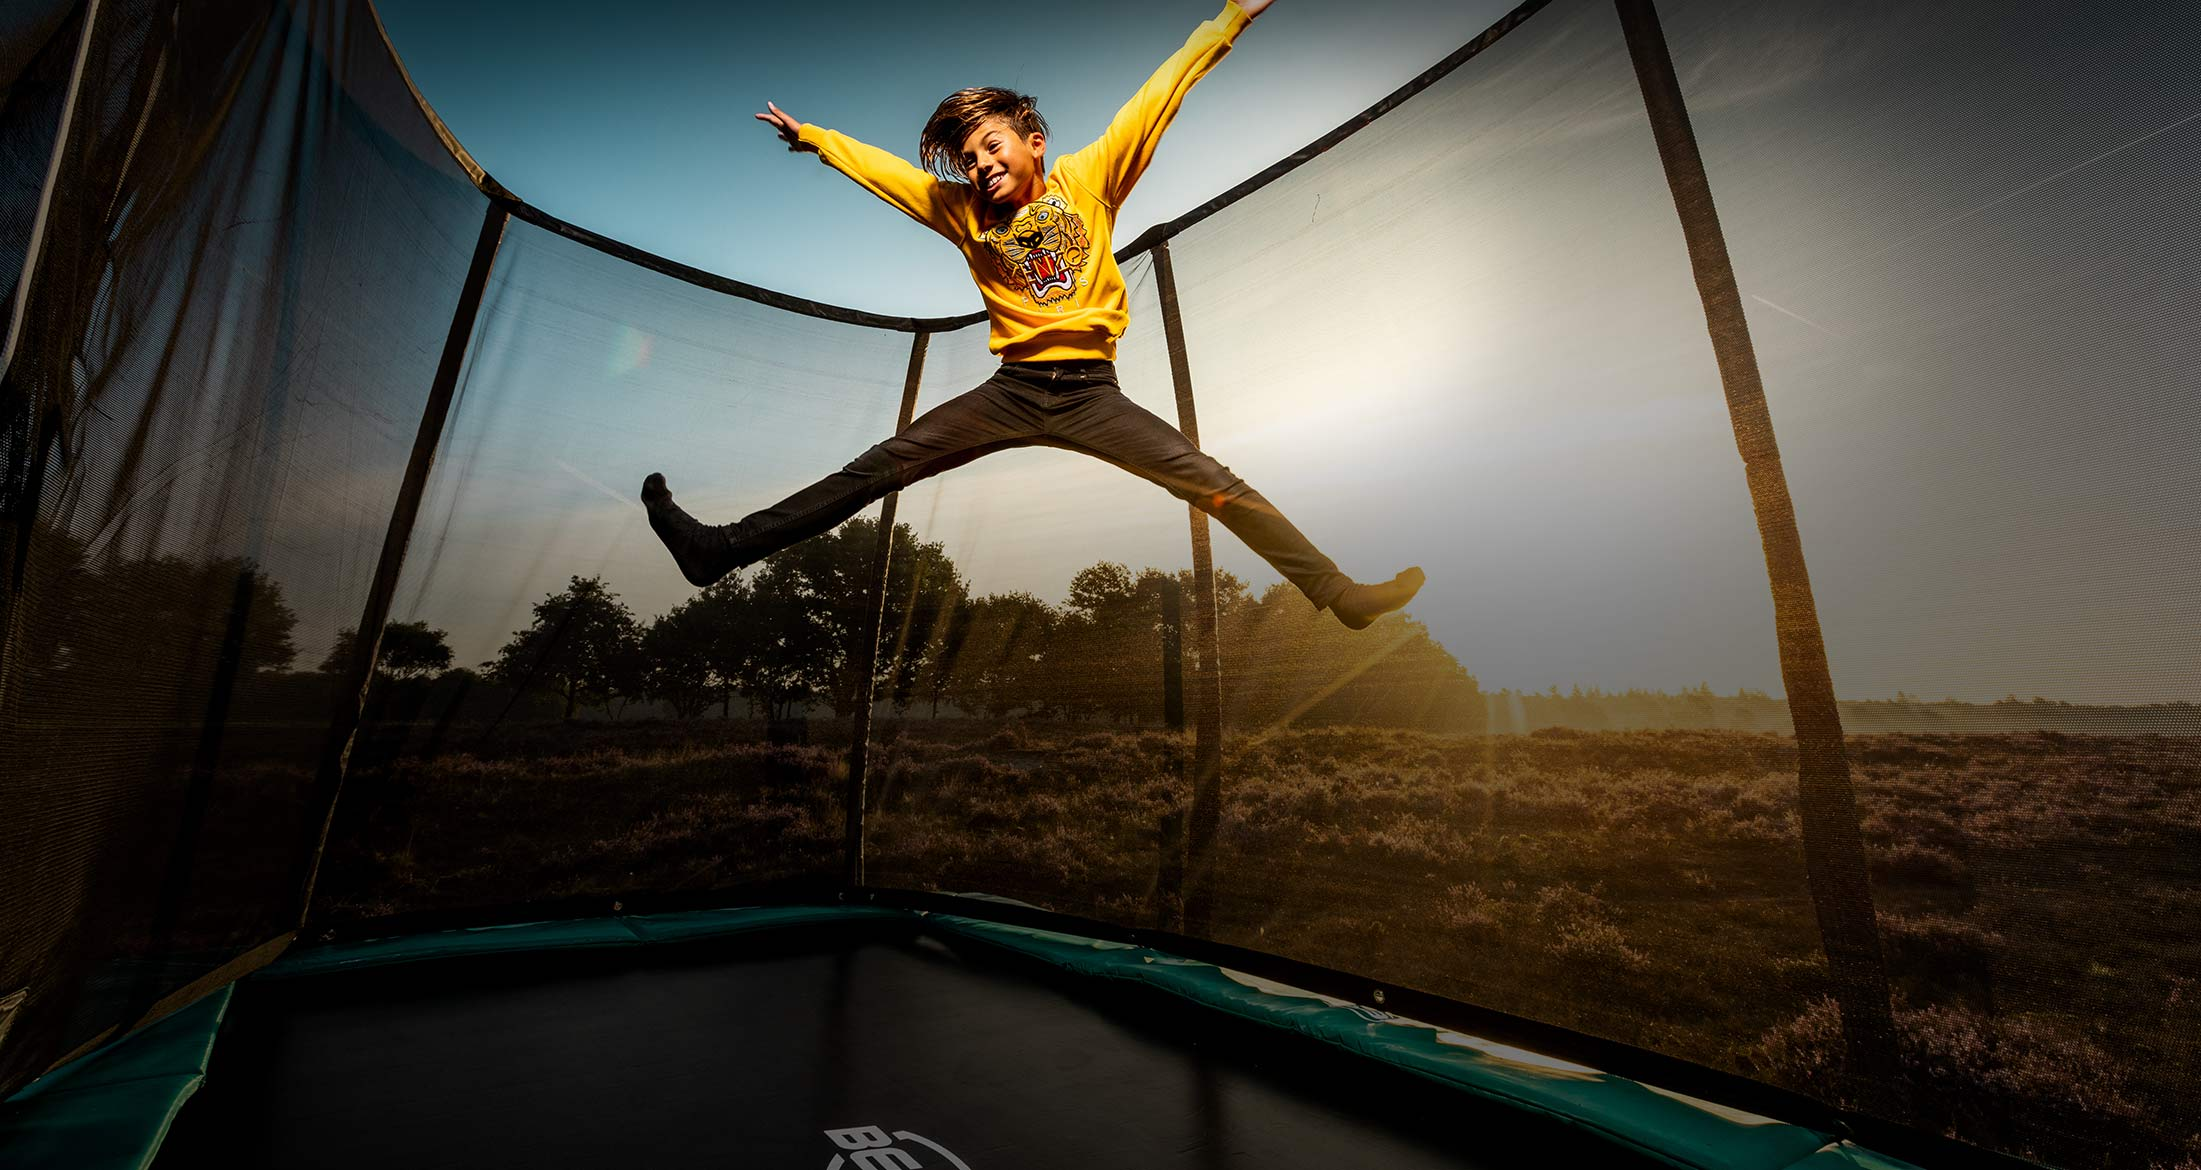 BERG Champion Modellübersicht - trampolin-profi.de